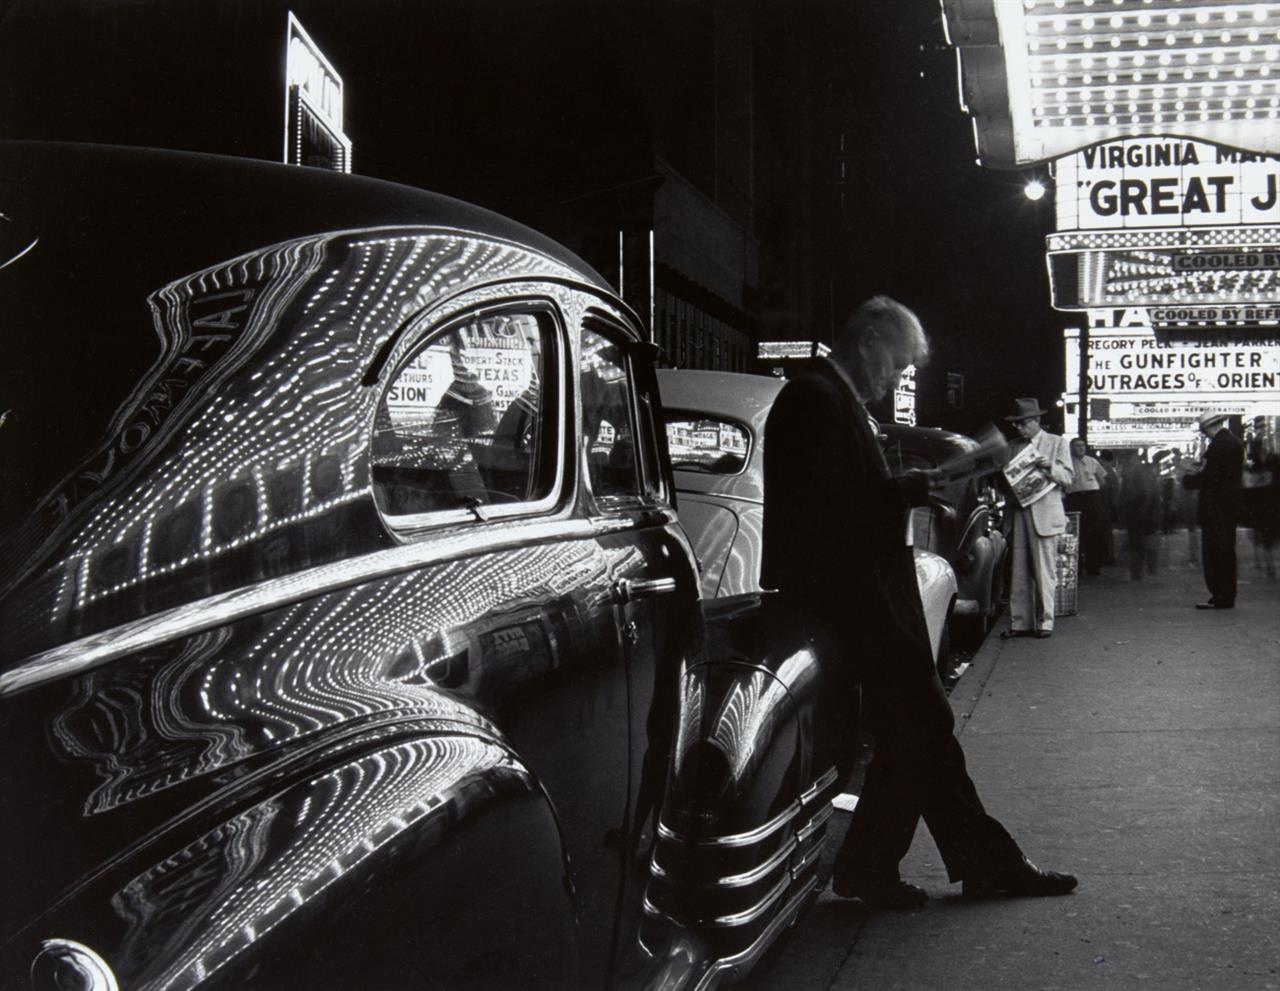 Benn Mitchell. New York, 42nd Street. 1949. Silbergelatineabzug. Signiert.